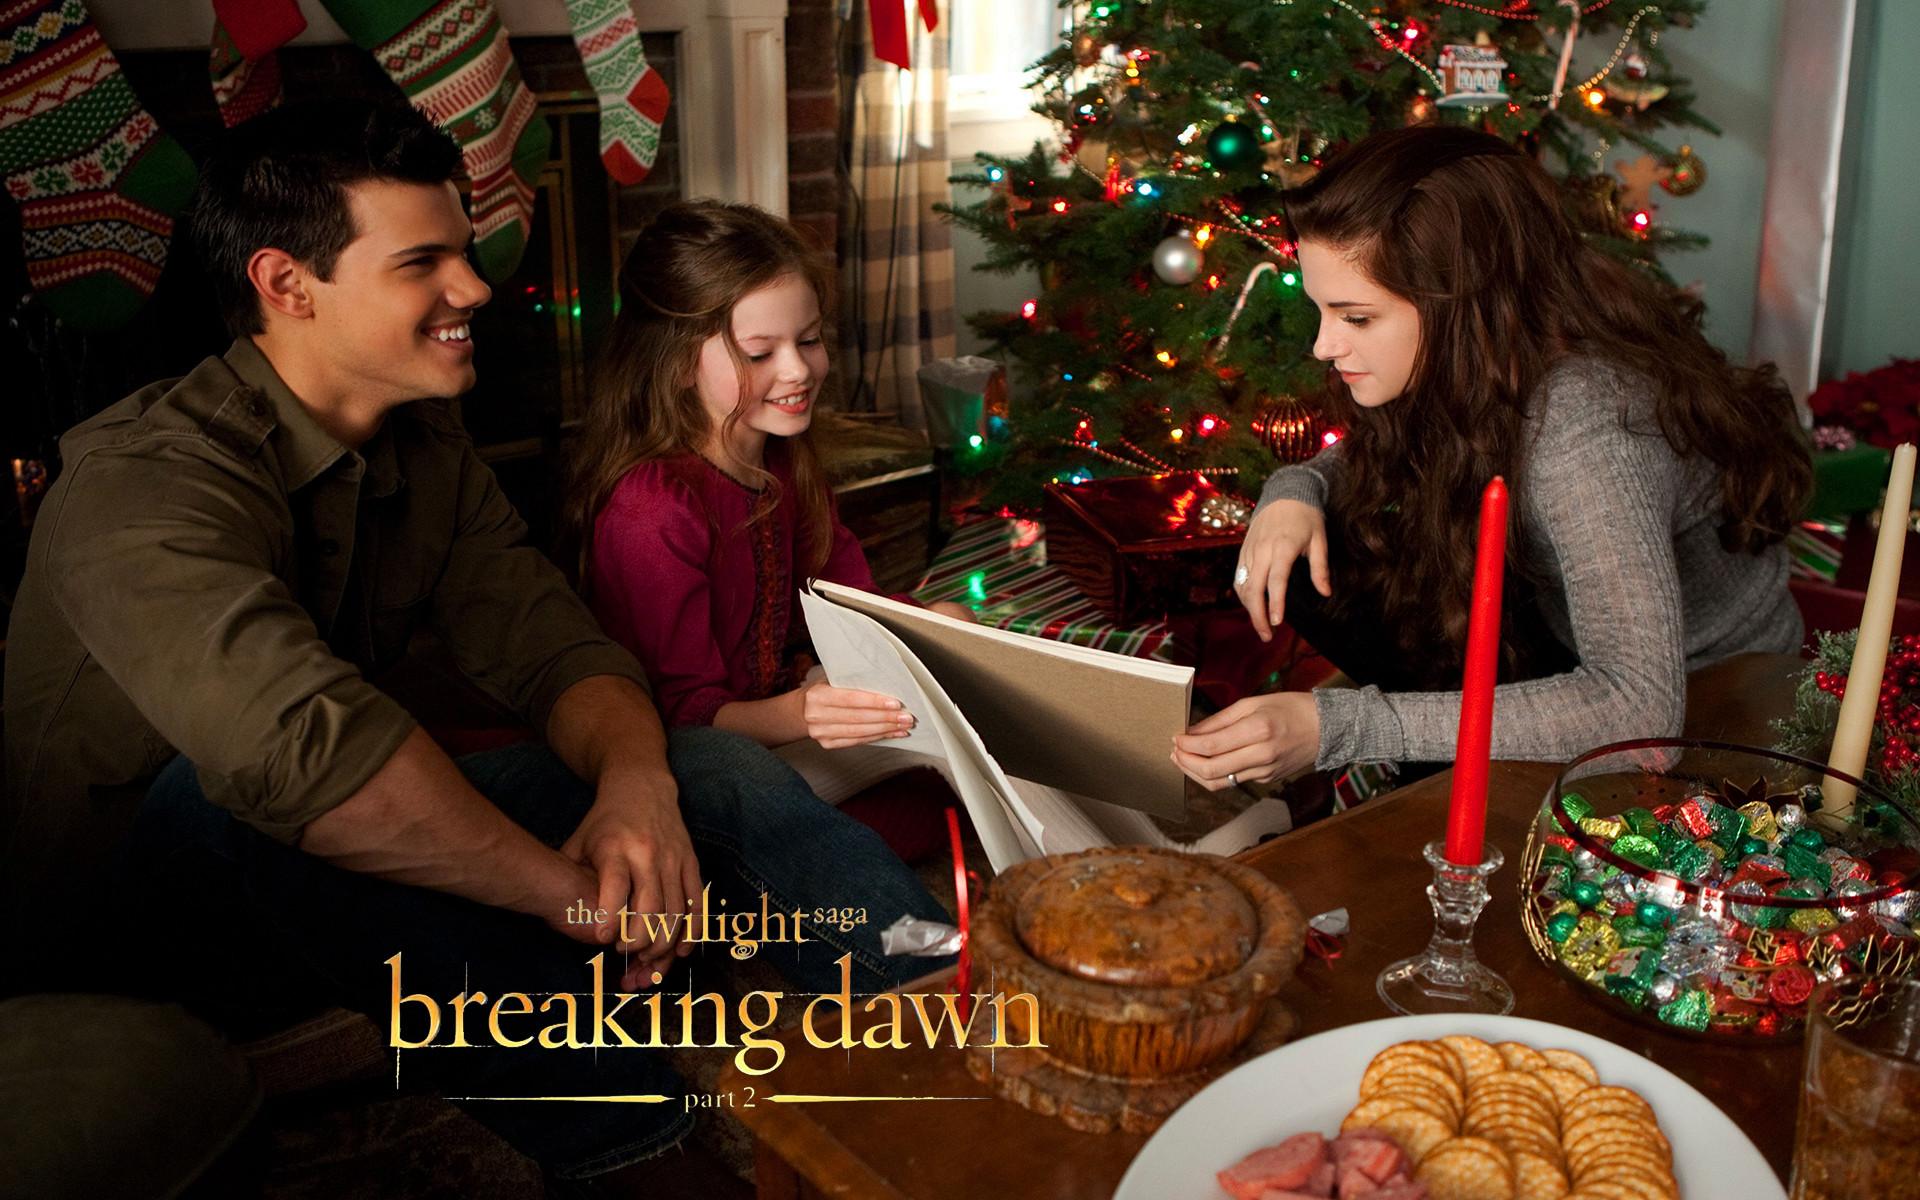 2560x1600 Free Wallpapers For Desktop Twilight Hd Twilght Breaking Dawn Part 2 Movie Wallpapers1